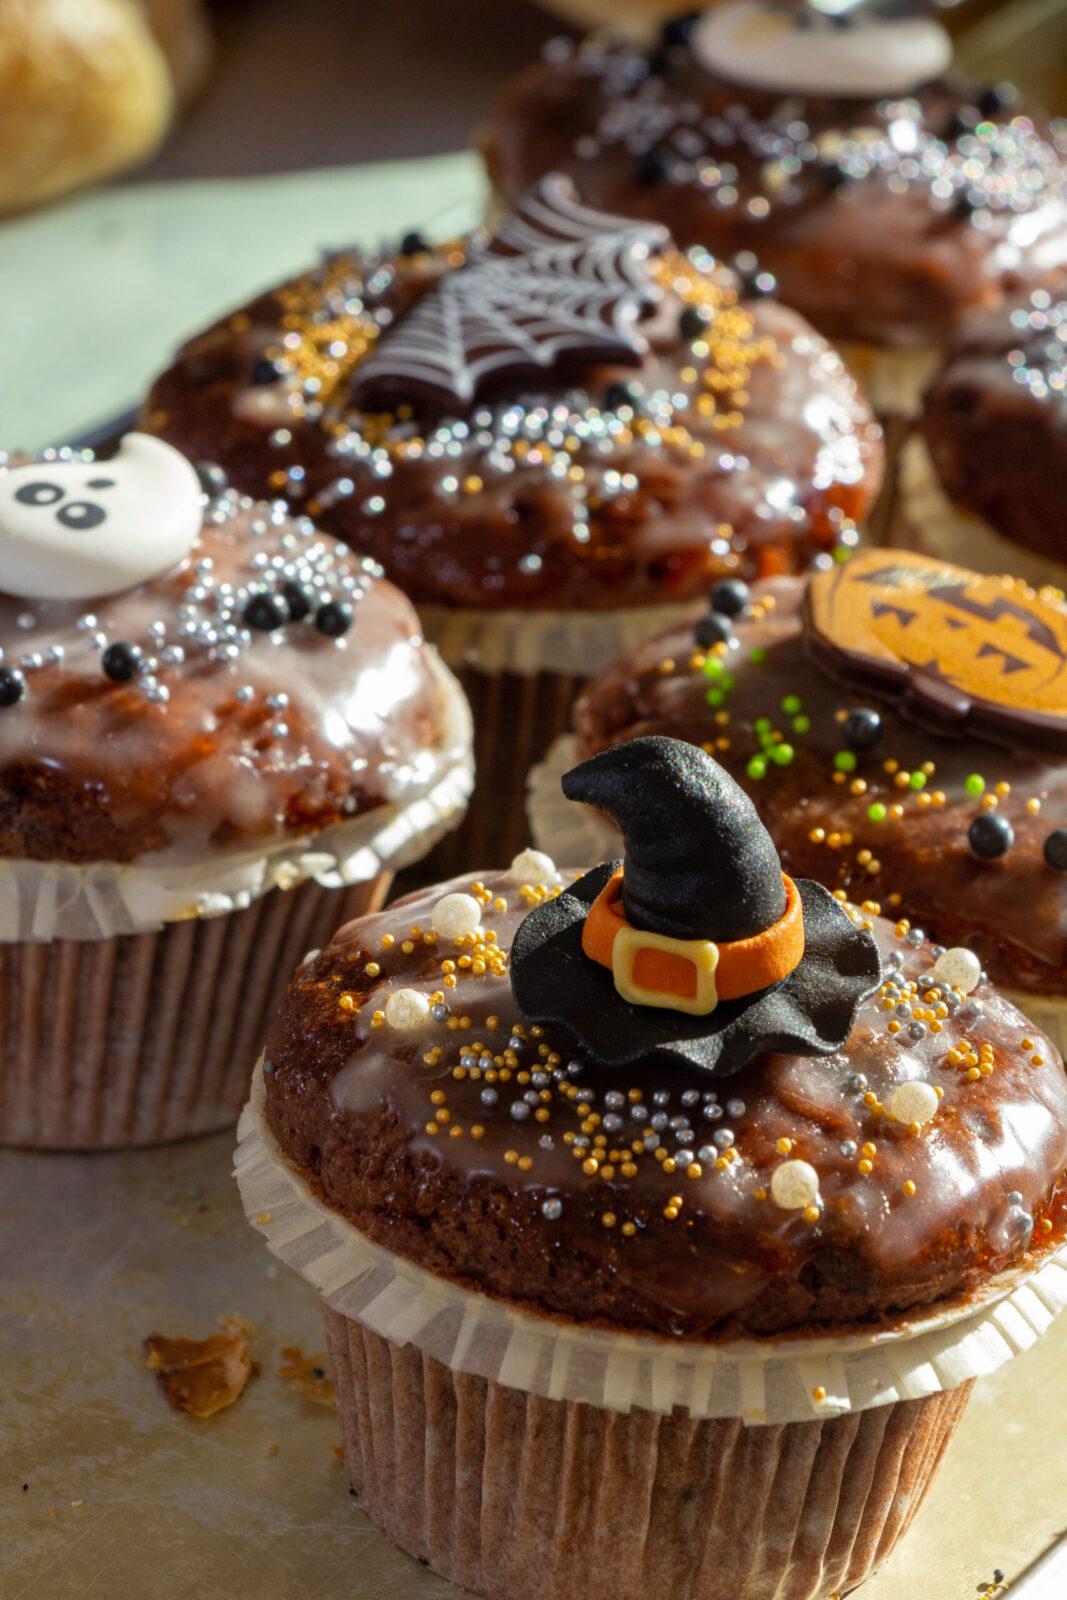 Conditorei & Café Bösewetter - Muffins